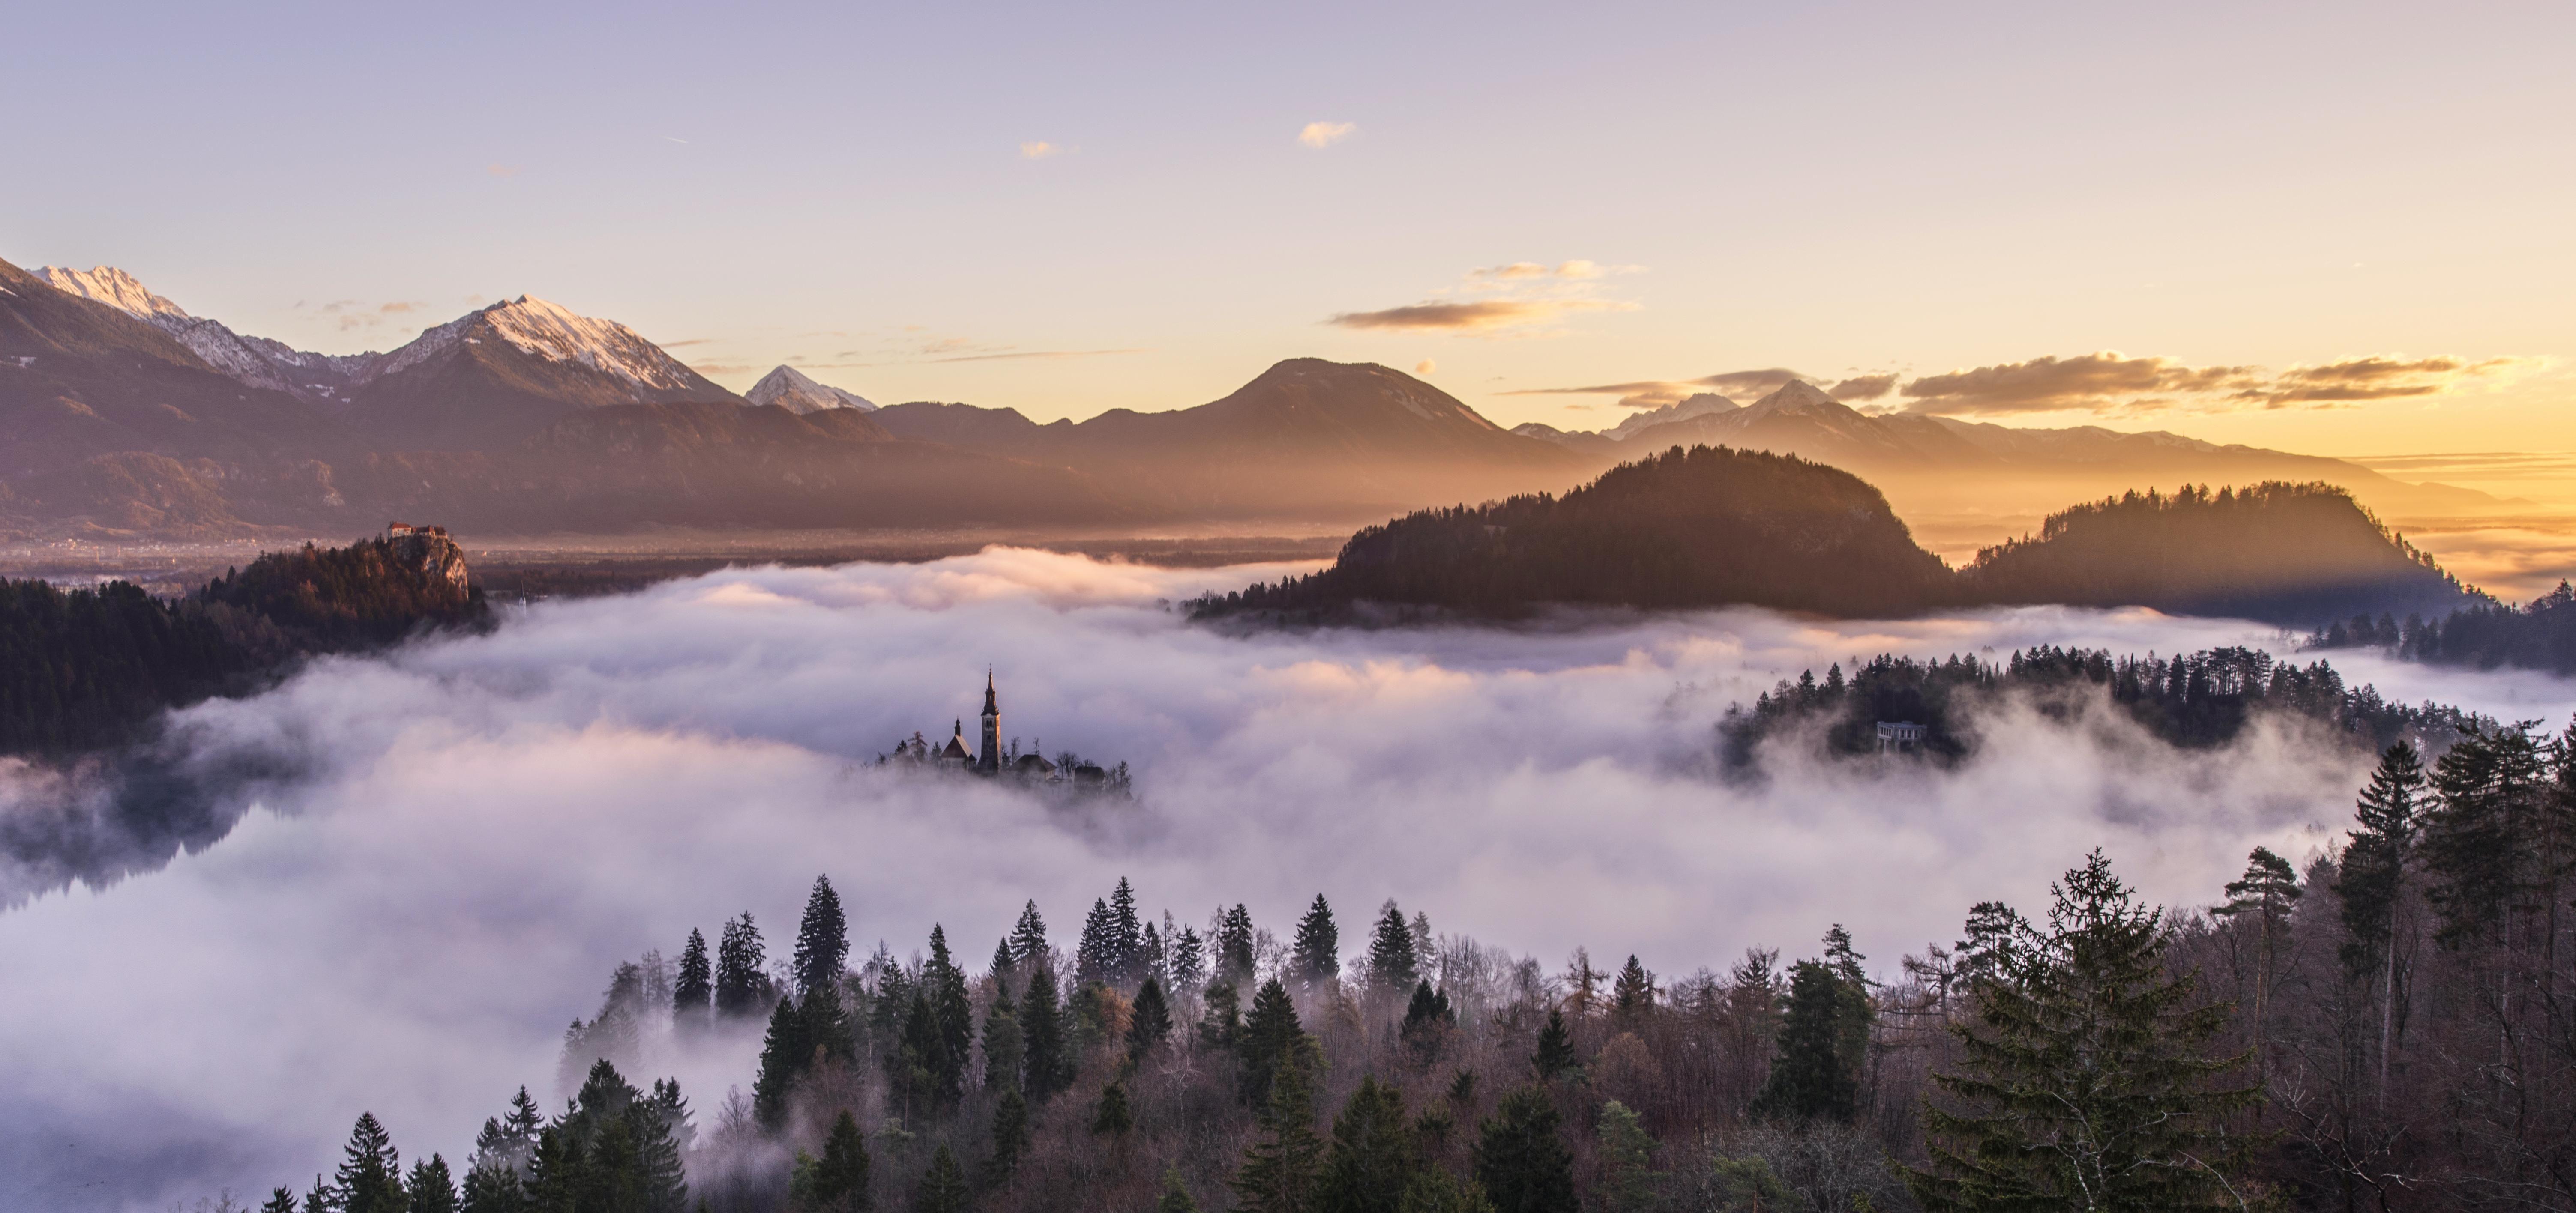 A Foggy Landscape x pixels Wallpapers Pinterest